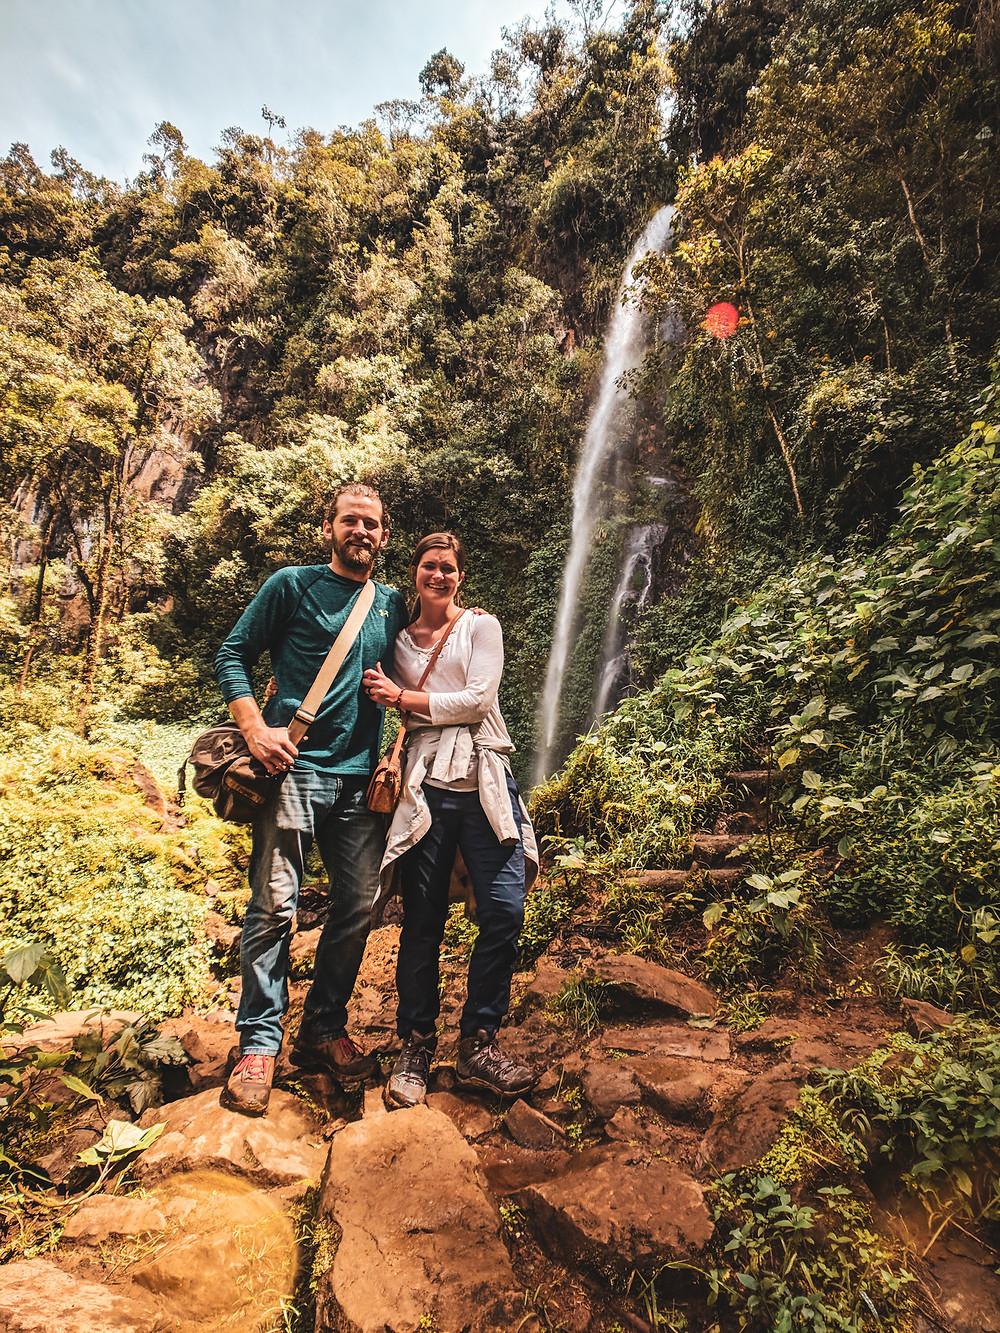 Exploring waterfalls in Jardin, Colombia.